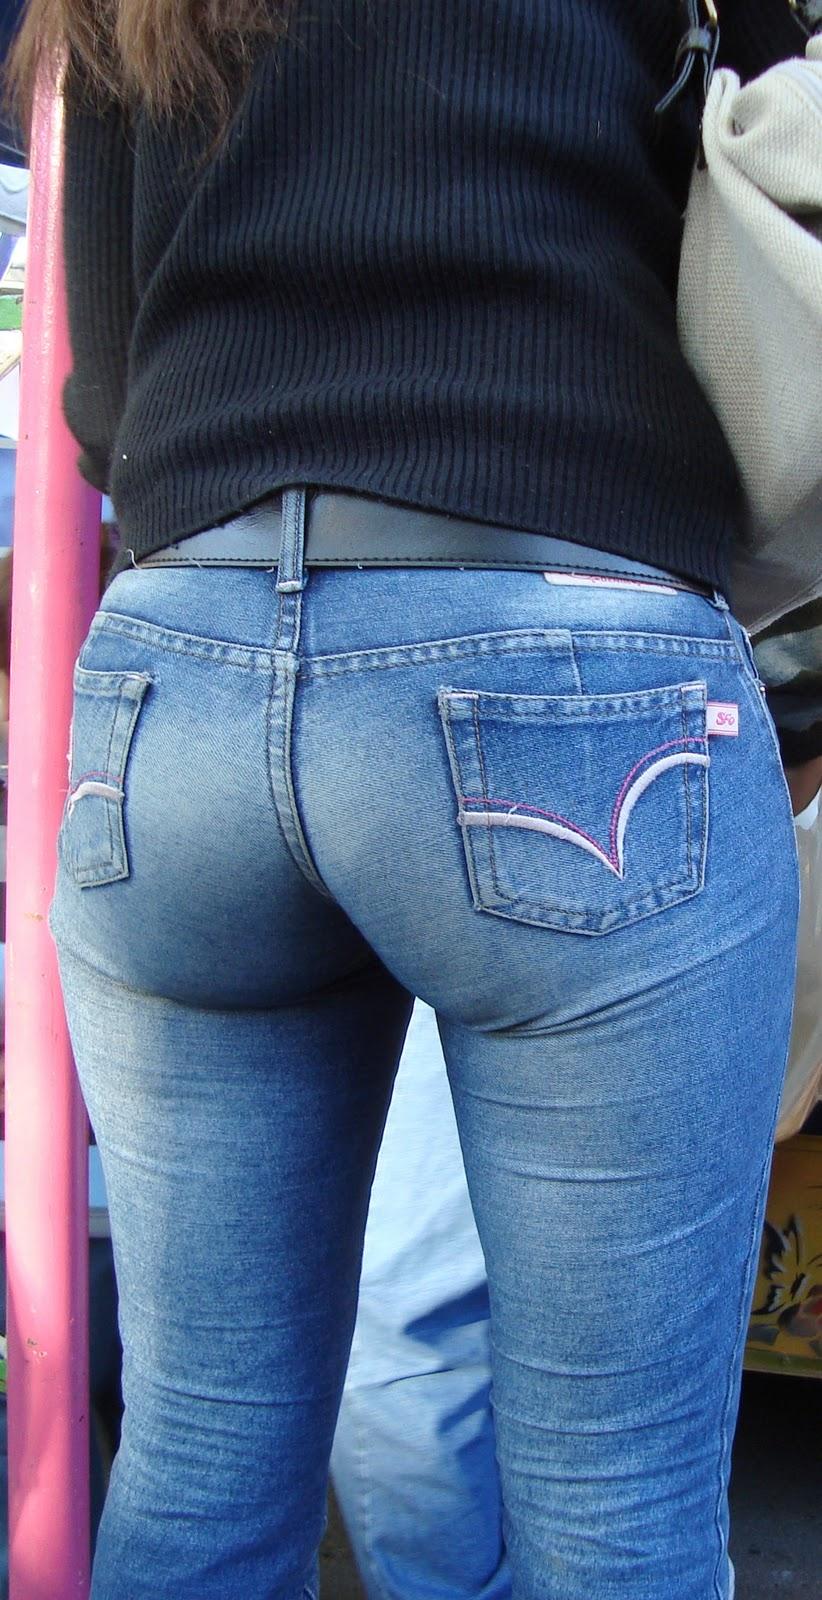 Nice ass jeans